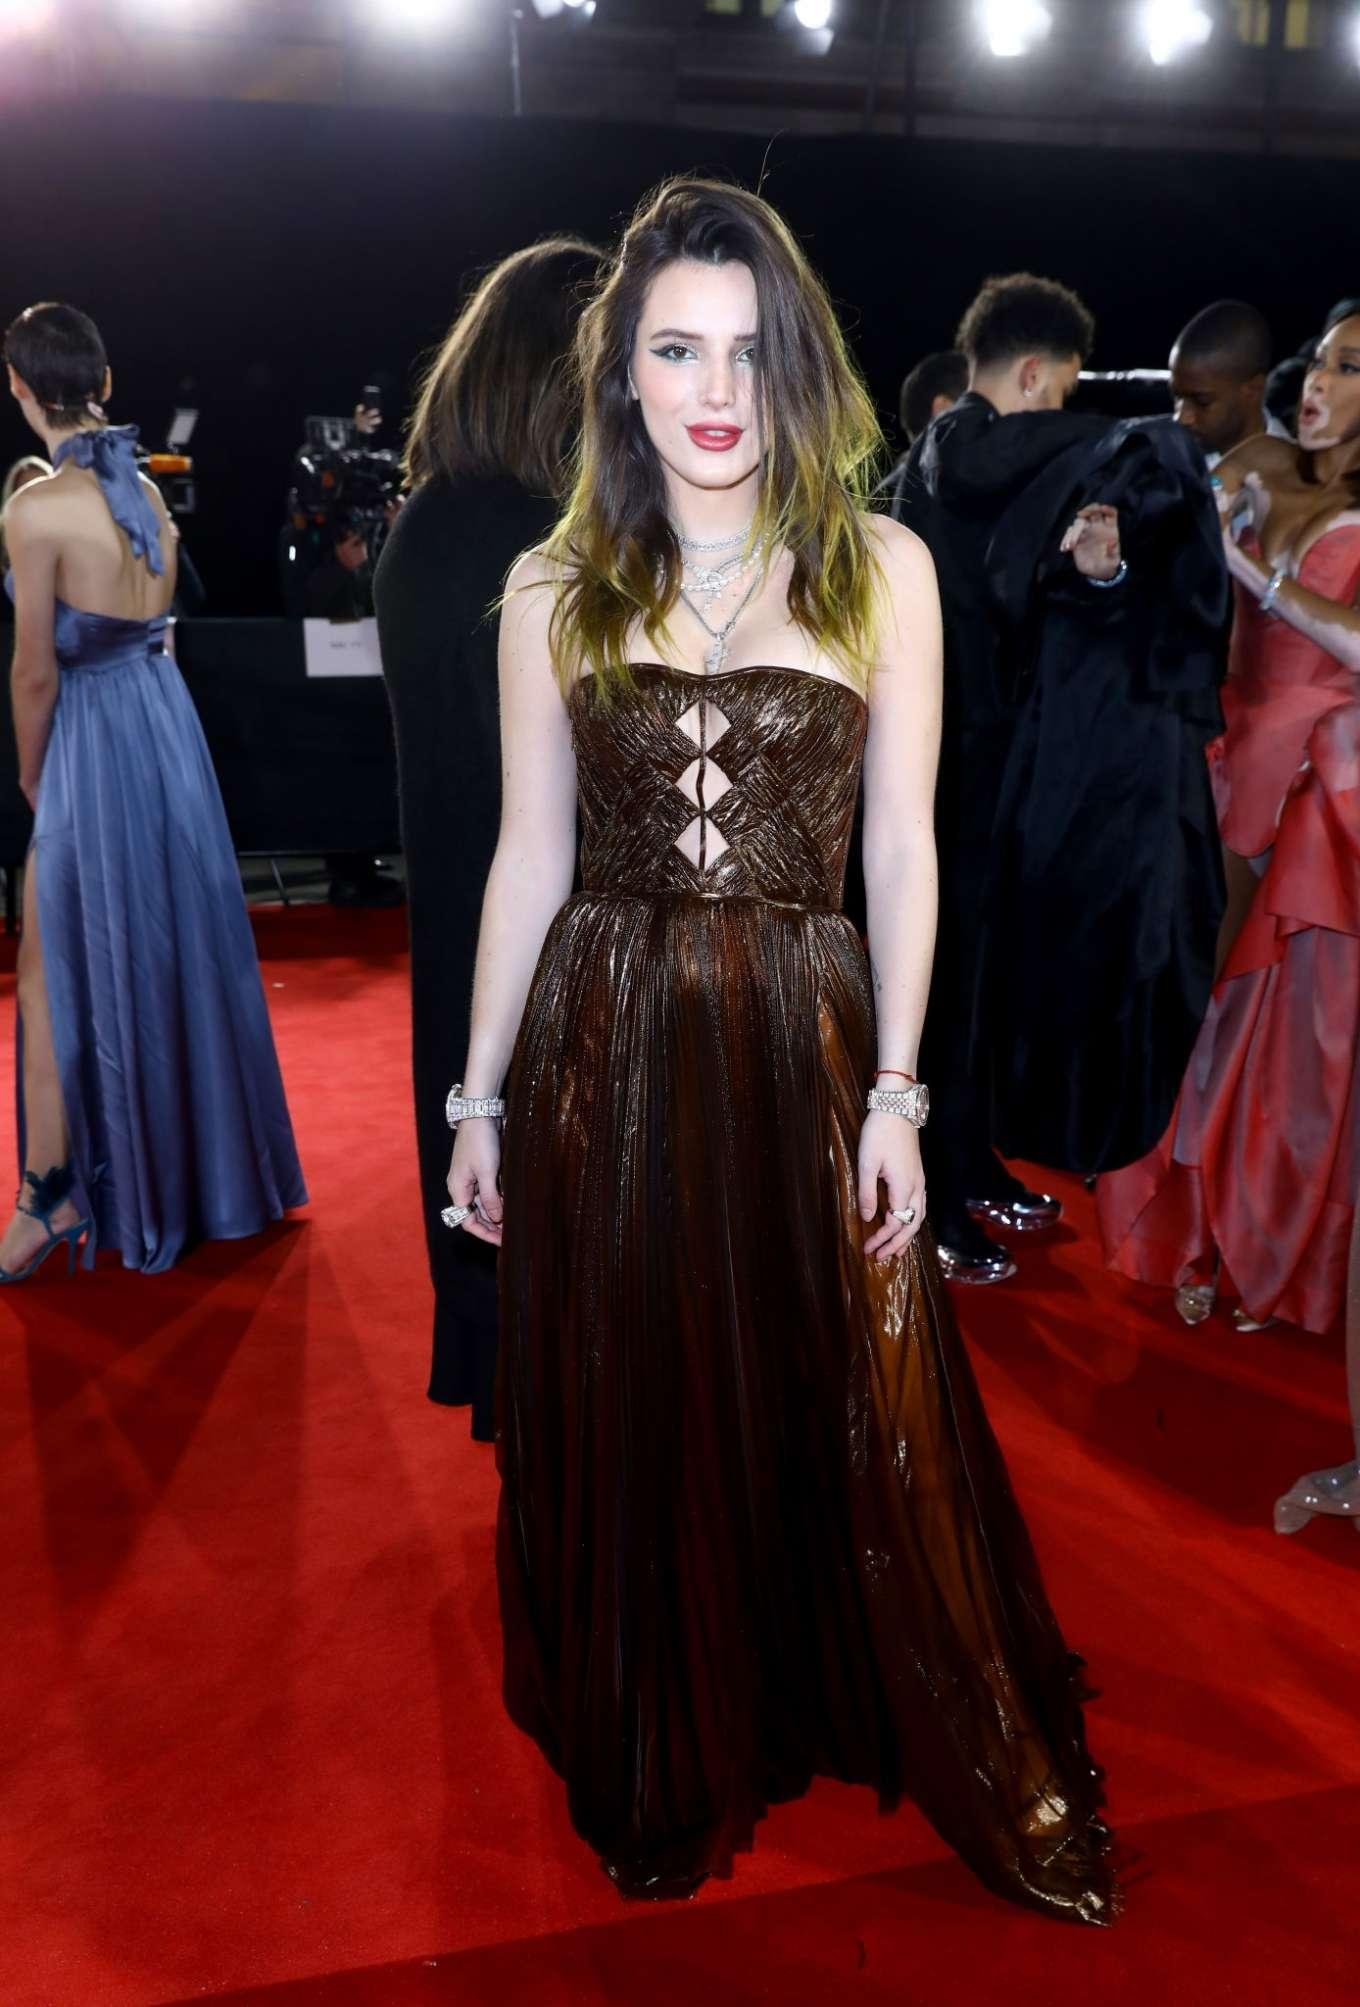 Bella Thorne 2019 : Bella Thorne – Fashion Awards 2019 in London-02